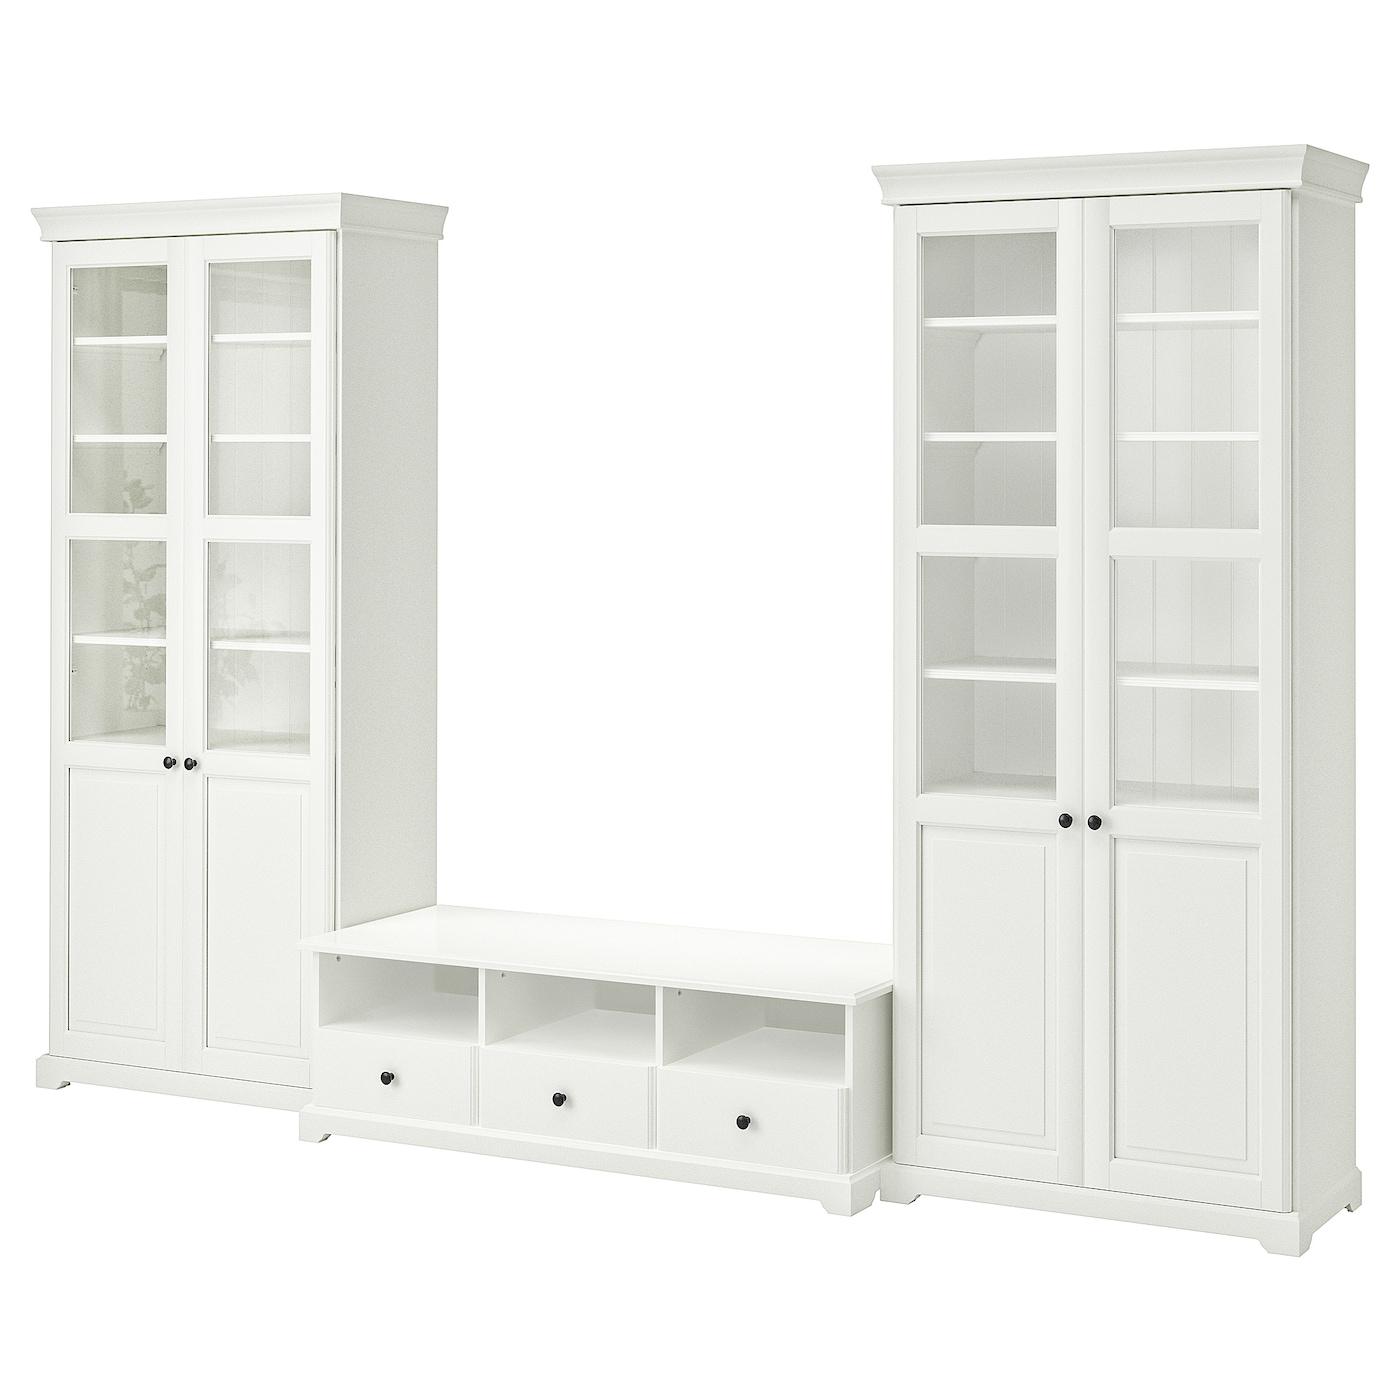 Liatorp combinaison meuble tv blanc 331 x 214 cm ikea - Ikea meuble tv blanc ...